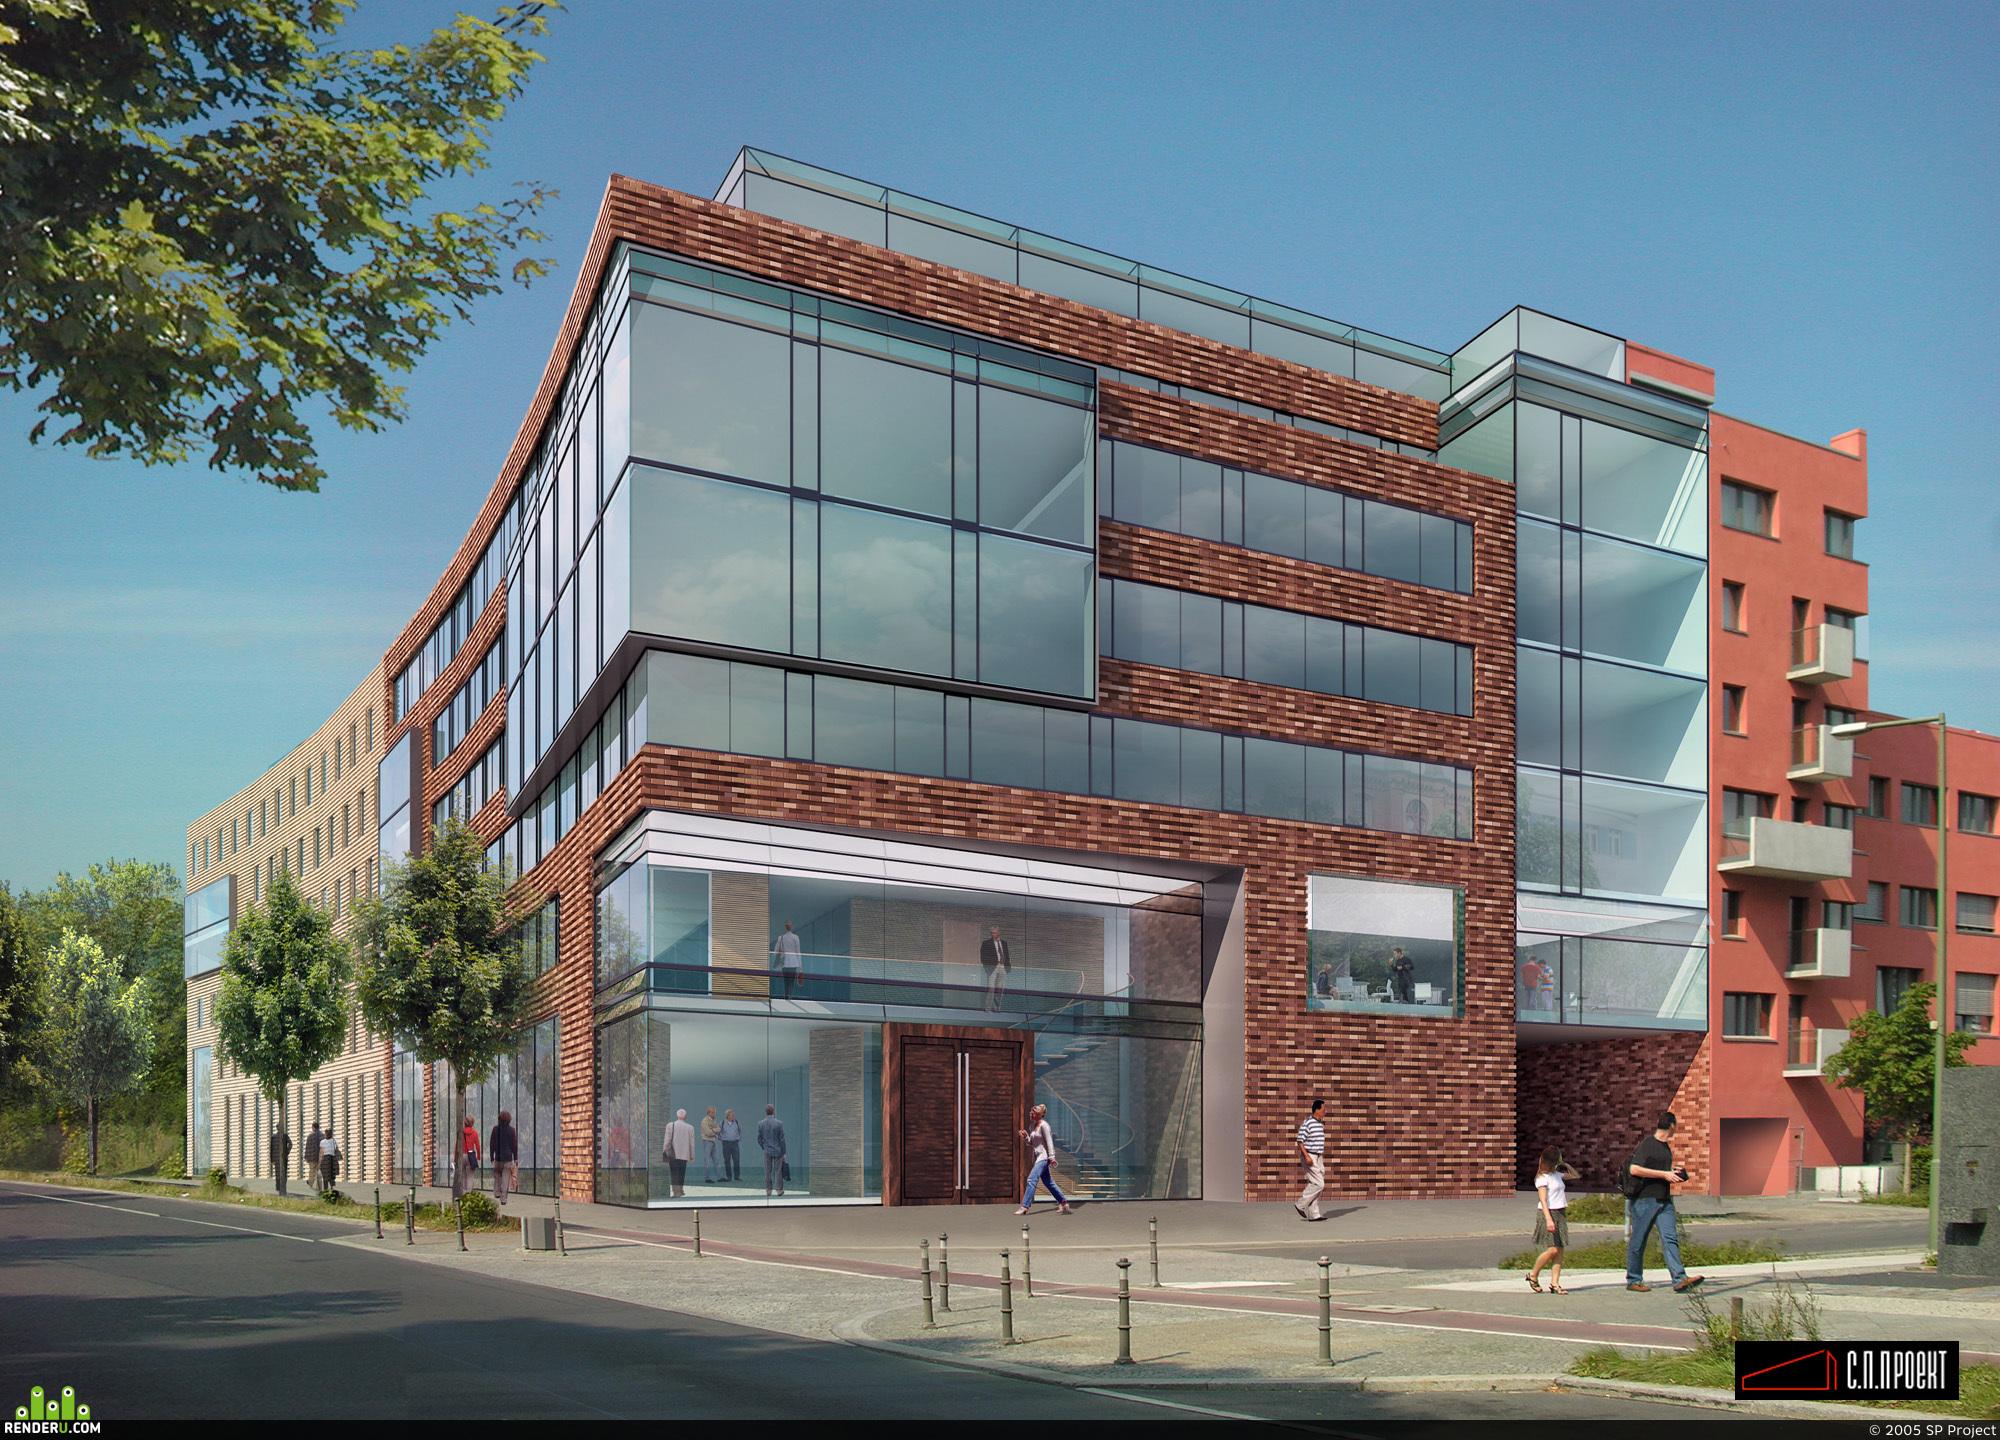 preview Визуализация административного здания в Германии